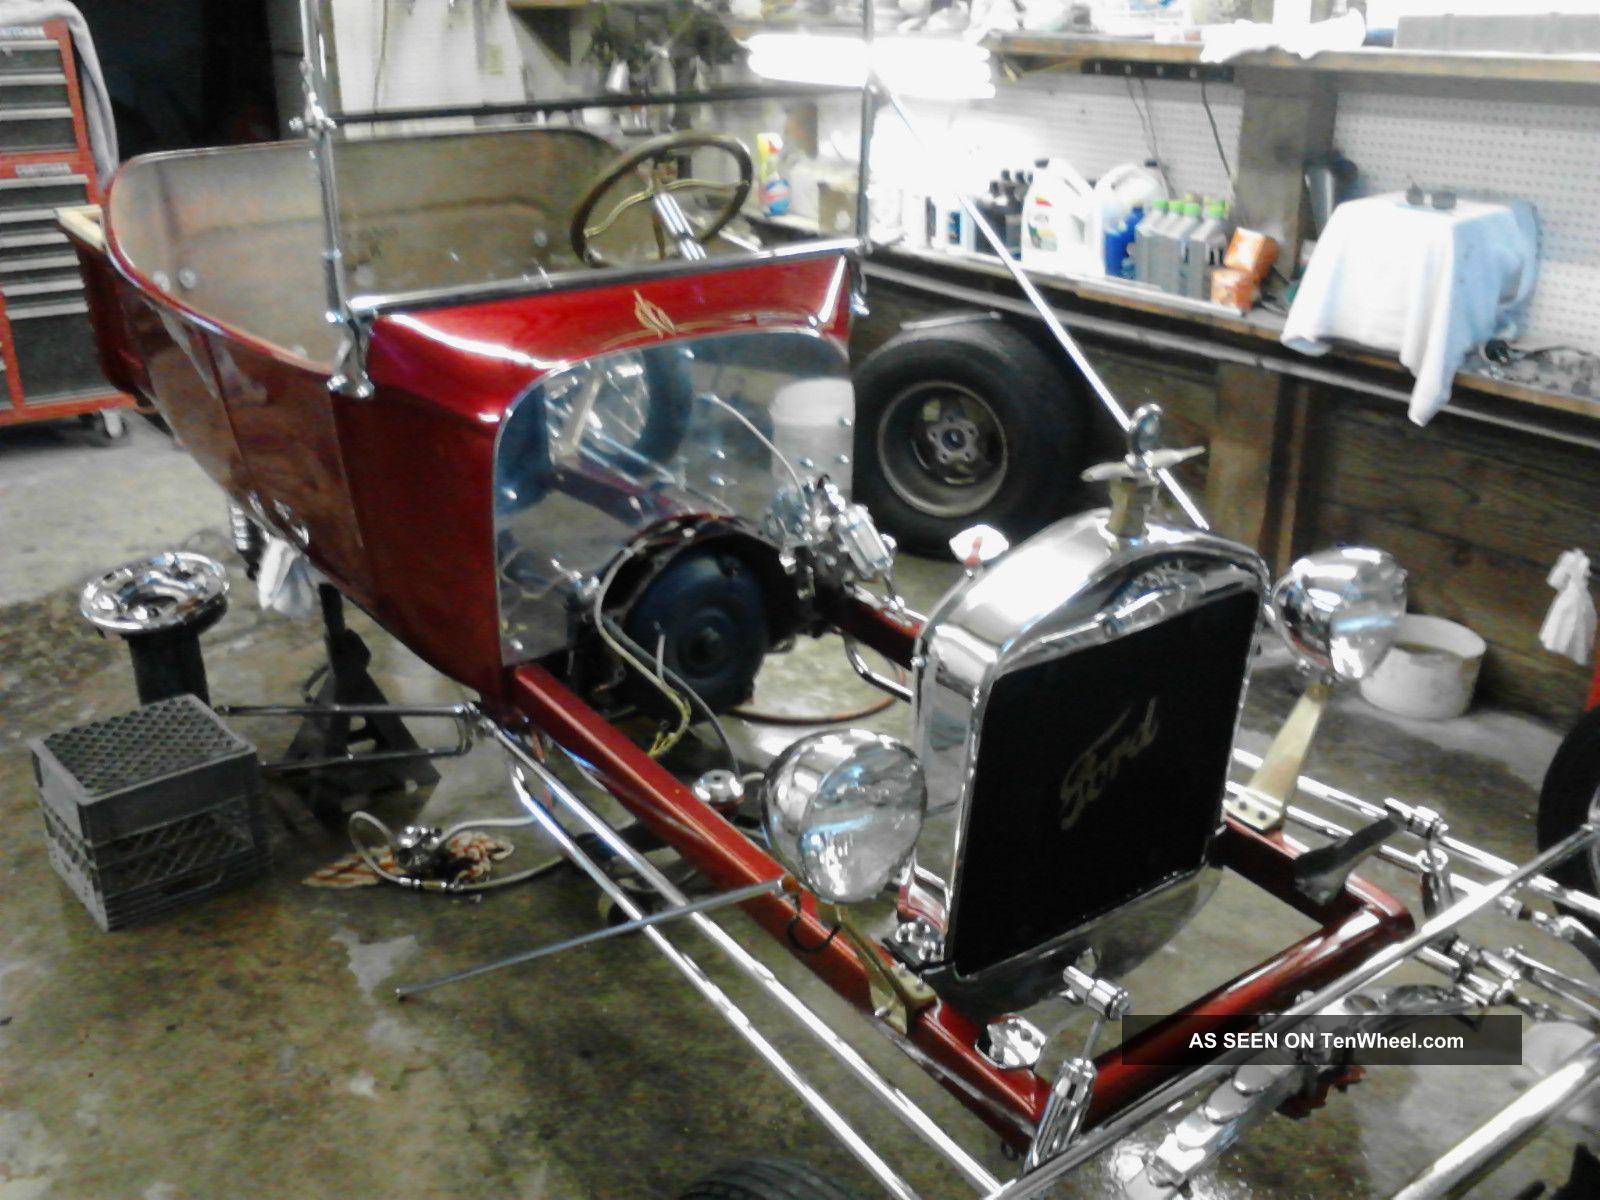 1923 Ford T - Bucket, Model - T, Streetrod, Hot Rod, Rat Rod Other